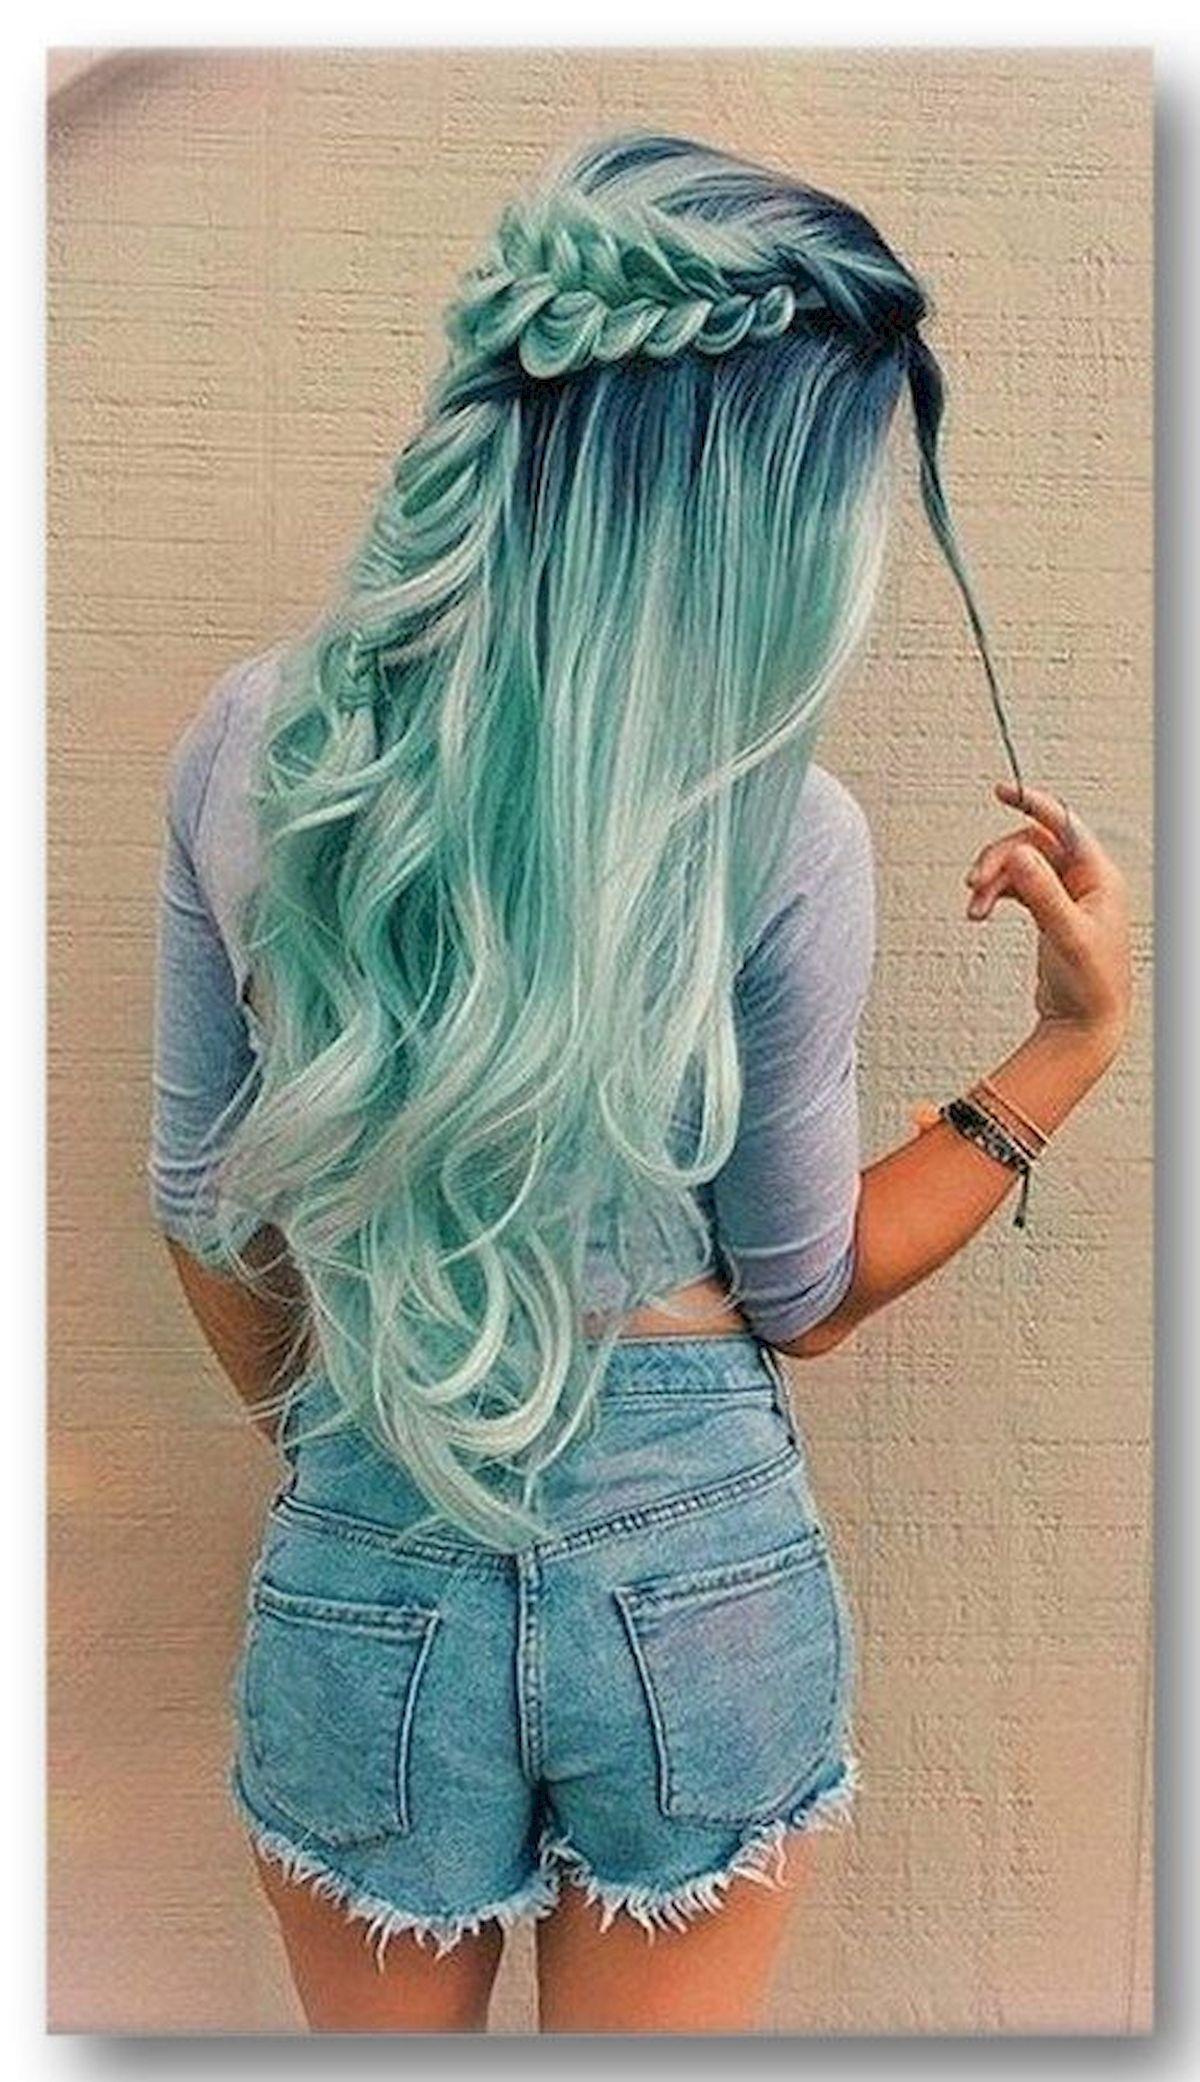 10 Cool Crazy Hair Color Ideas 1 Blue Ombre Hair Cute Hair Colors Hair Color Blue